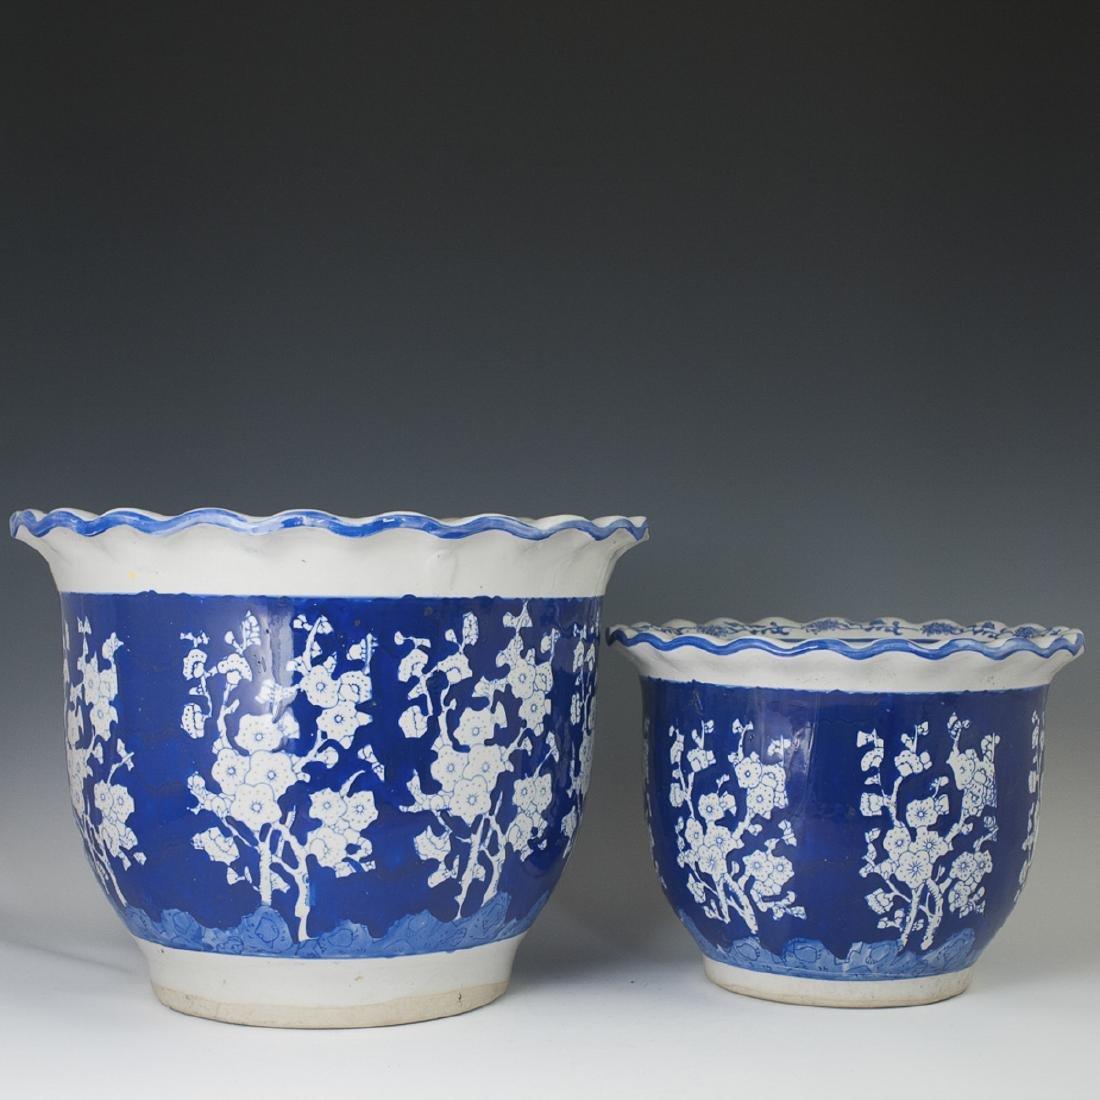 Chinese Porcelain Prunus Fishbowls